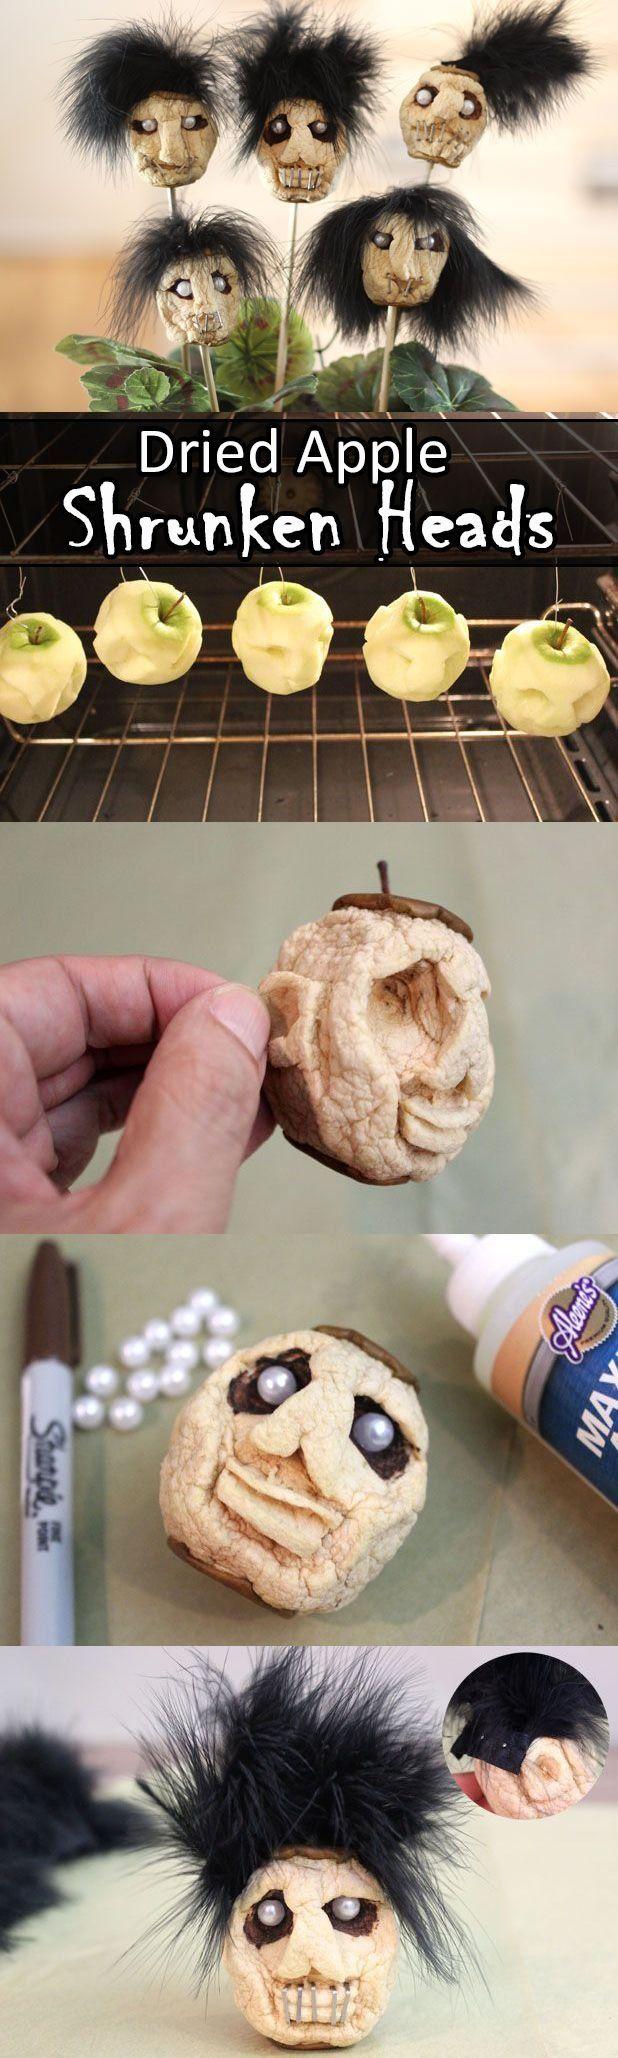 How to Make Dried Apple Shrunken Heads. Creepy Halloween  DecorationsHalloween ...